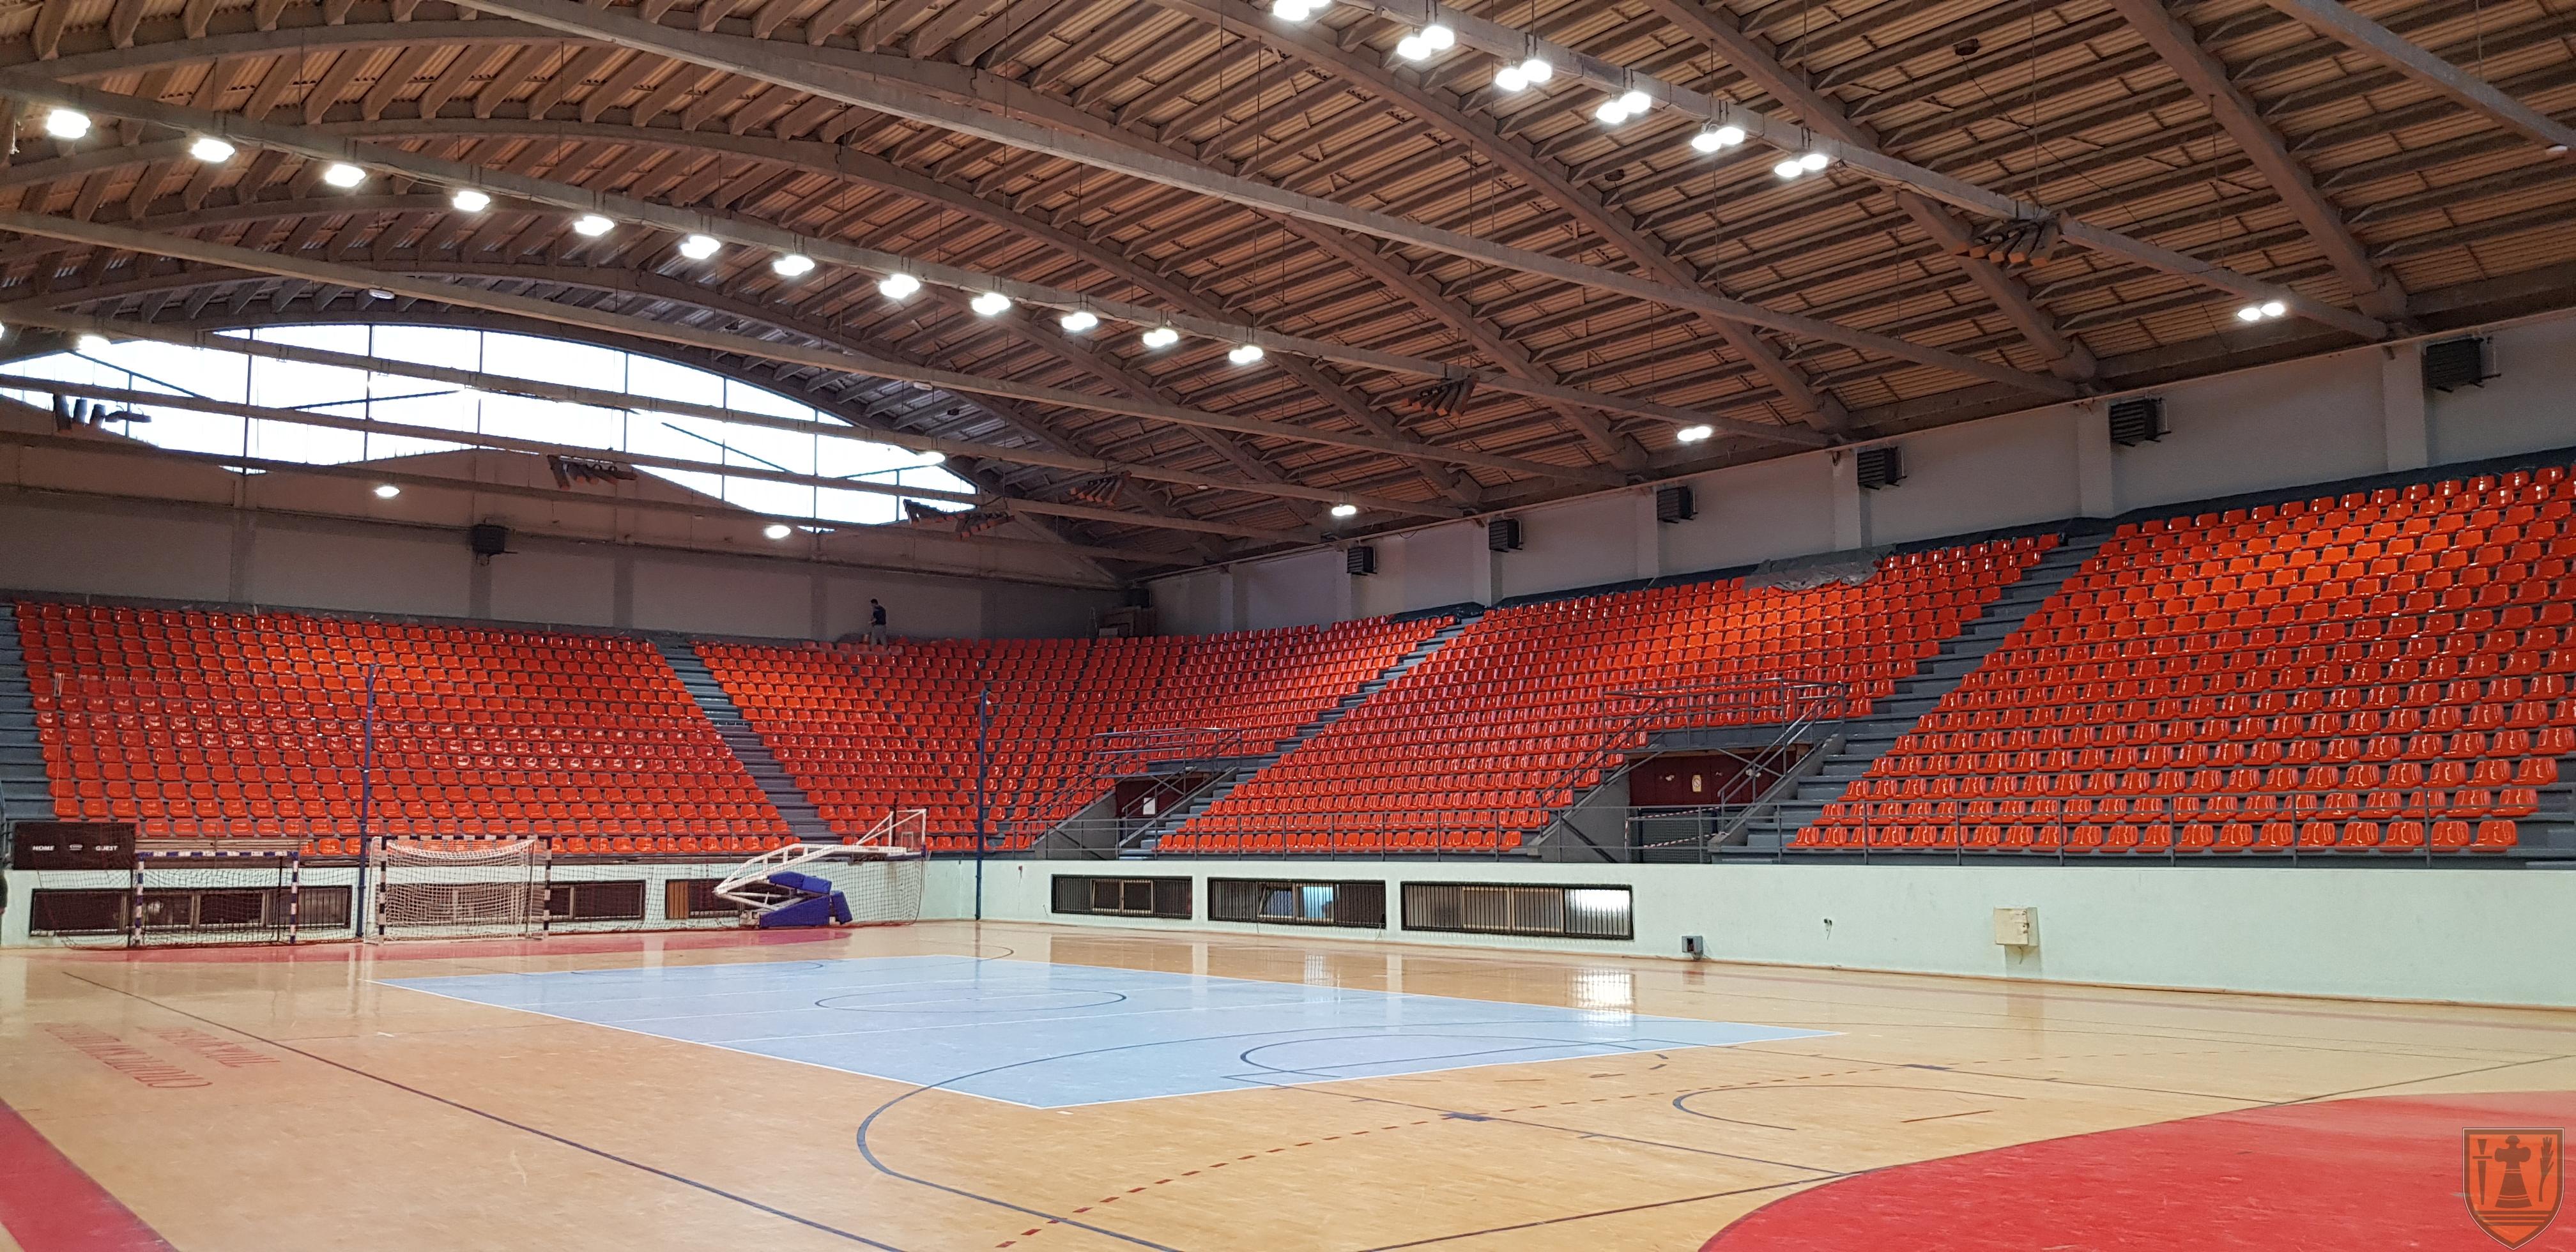 Gradonačelnik Grada Požarevca Bane Spasović sa saradnicima obišao radove na rekonstrukciji Sportskog centra 14720